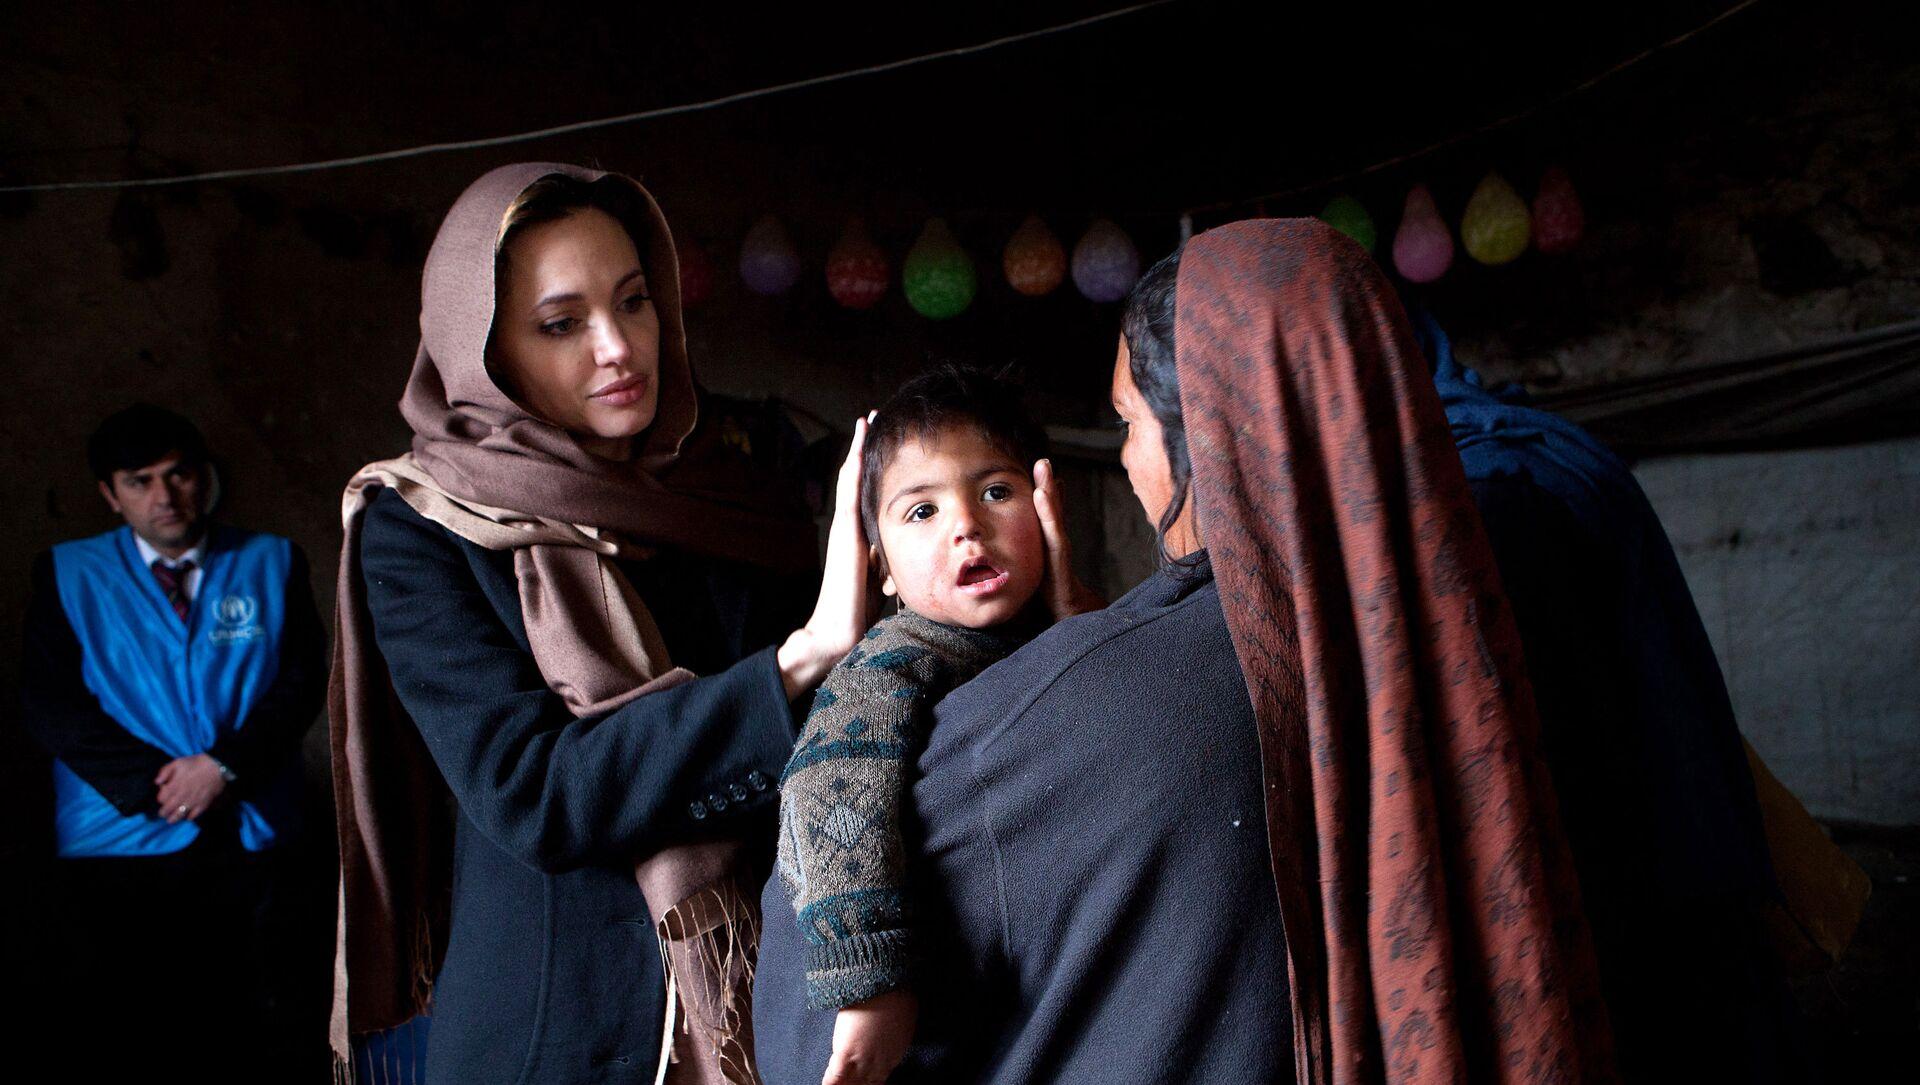 Анджелина Джоли в Кабуле, фото из архива - Sputnik Азербайджан, 1920, 21.08.2021